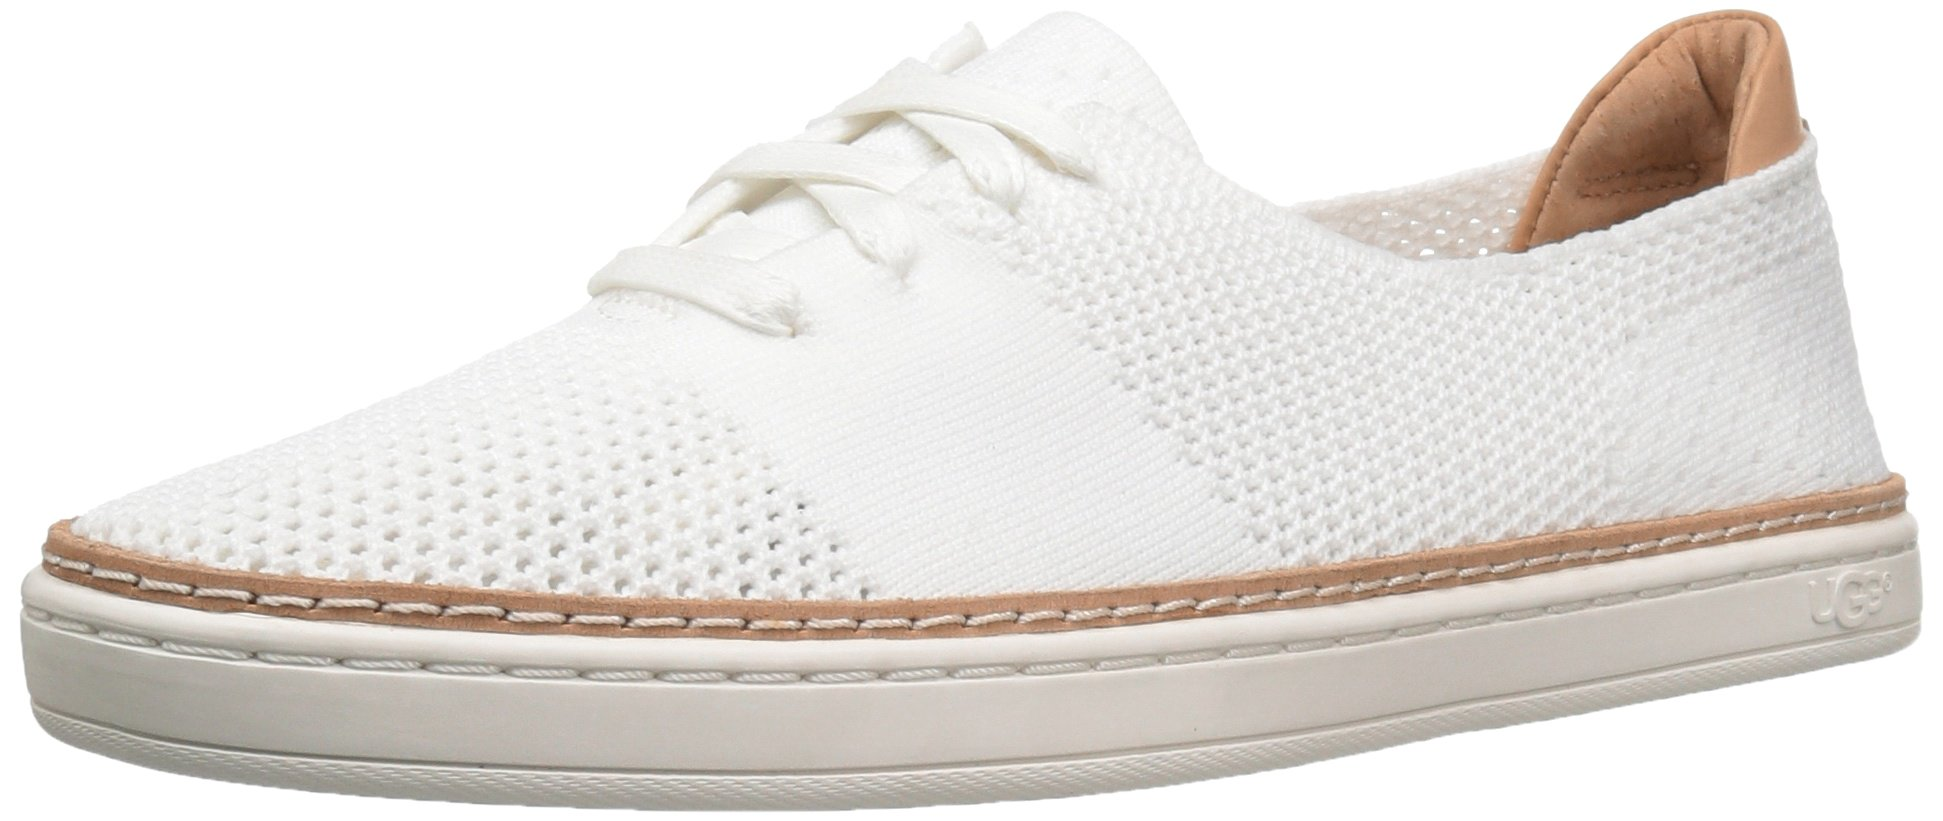 UGG Women's Pinkett Fashion Sneaker, White, 6 B US